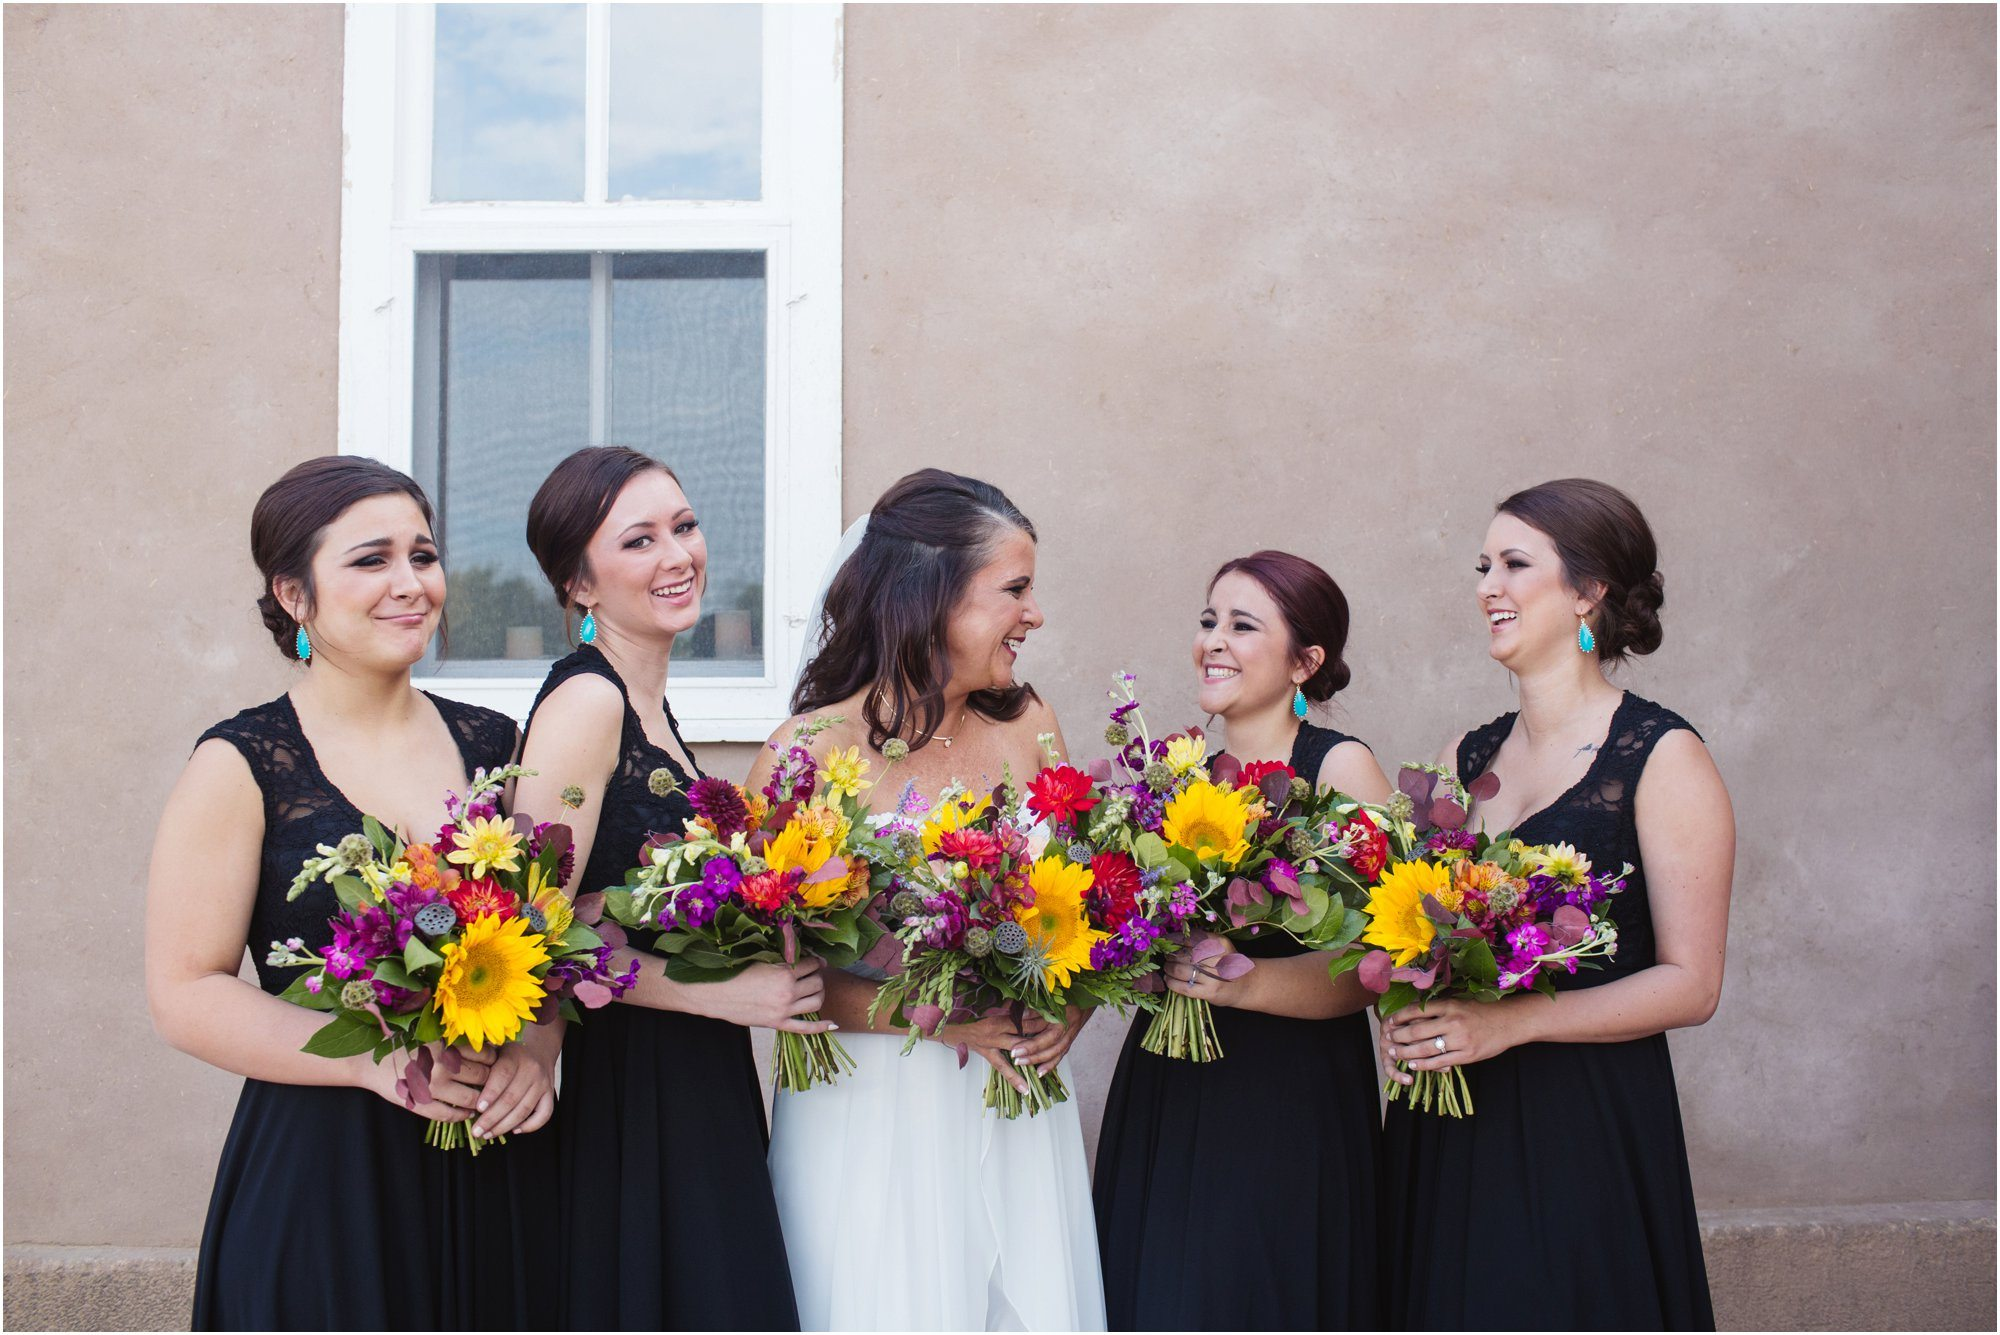 039BlueRosePhotography_ Albuquerque wedding photographers